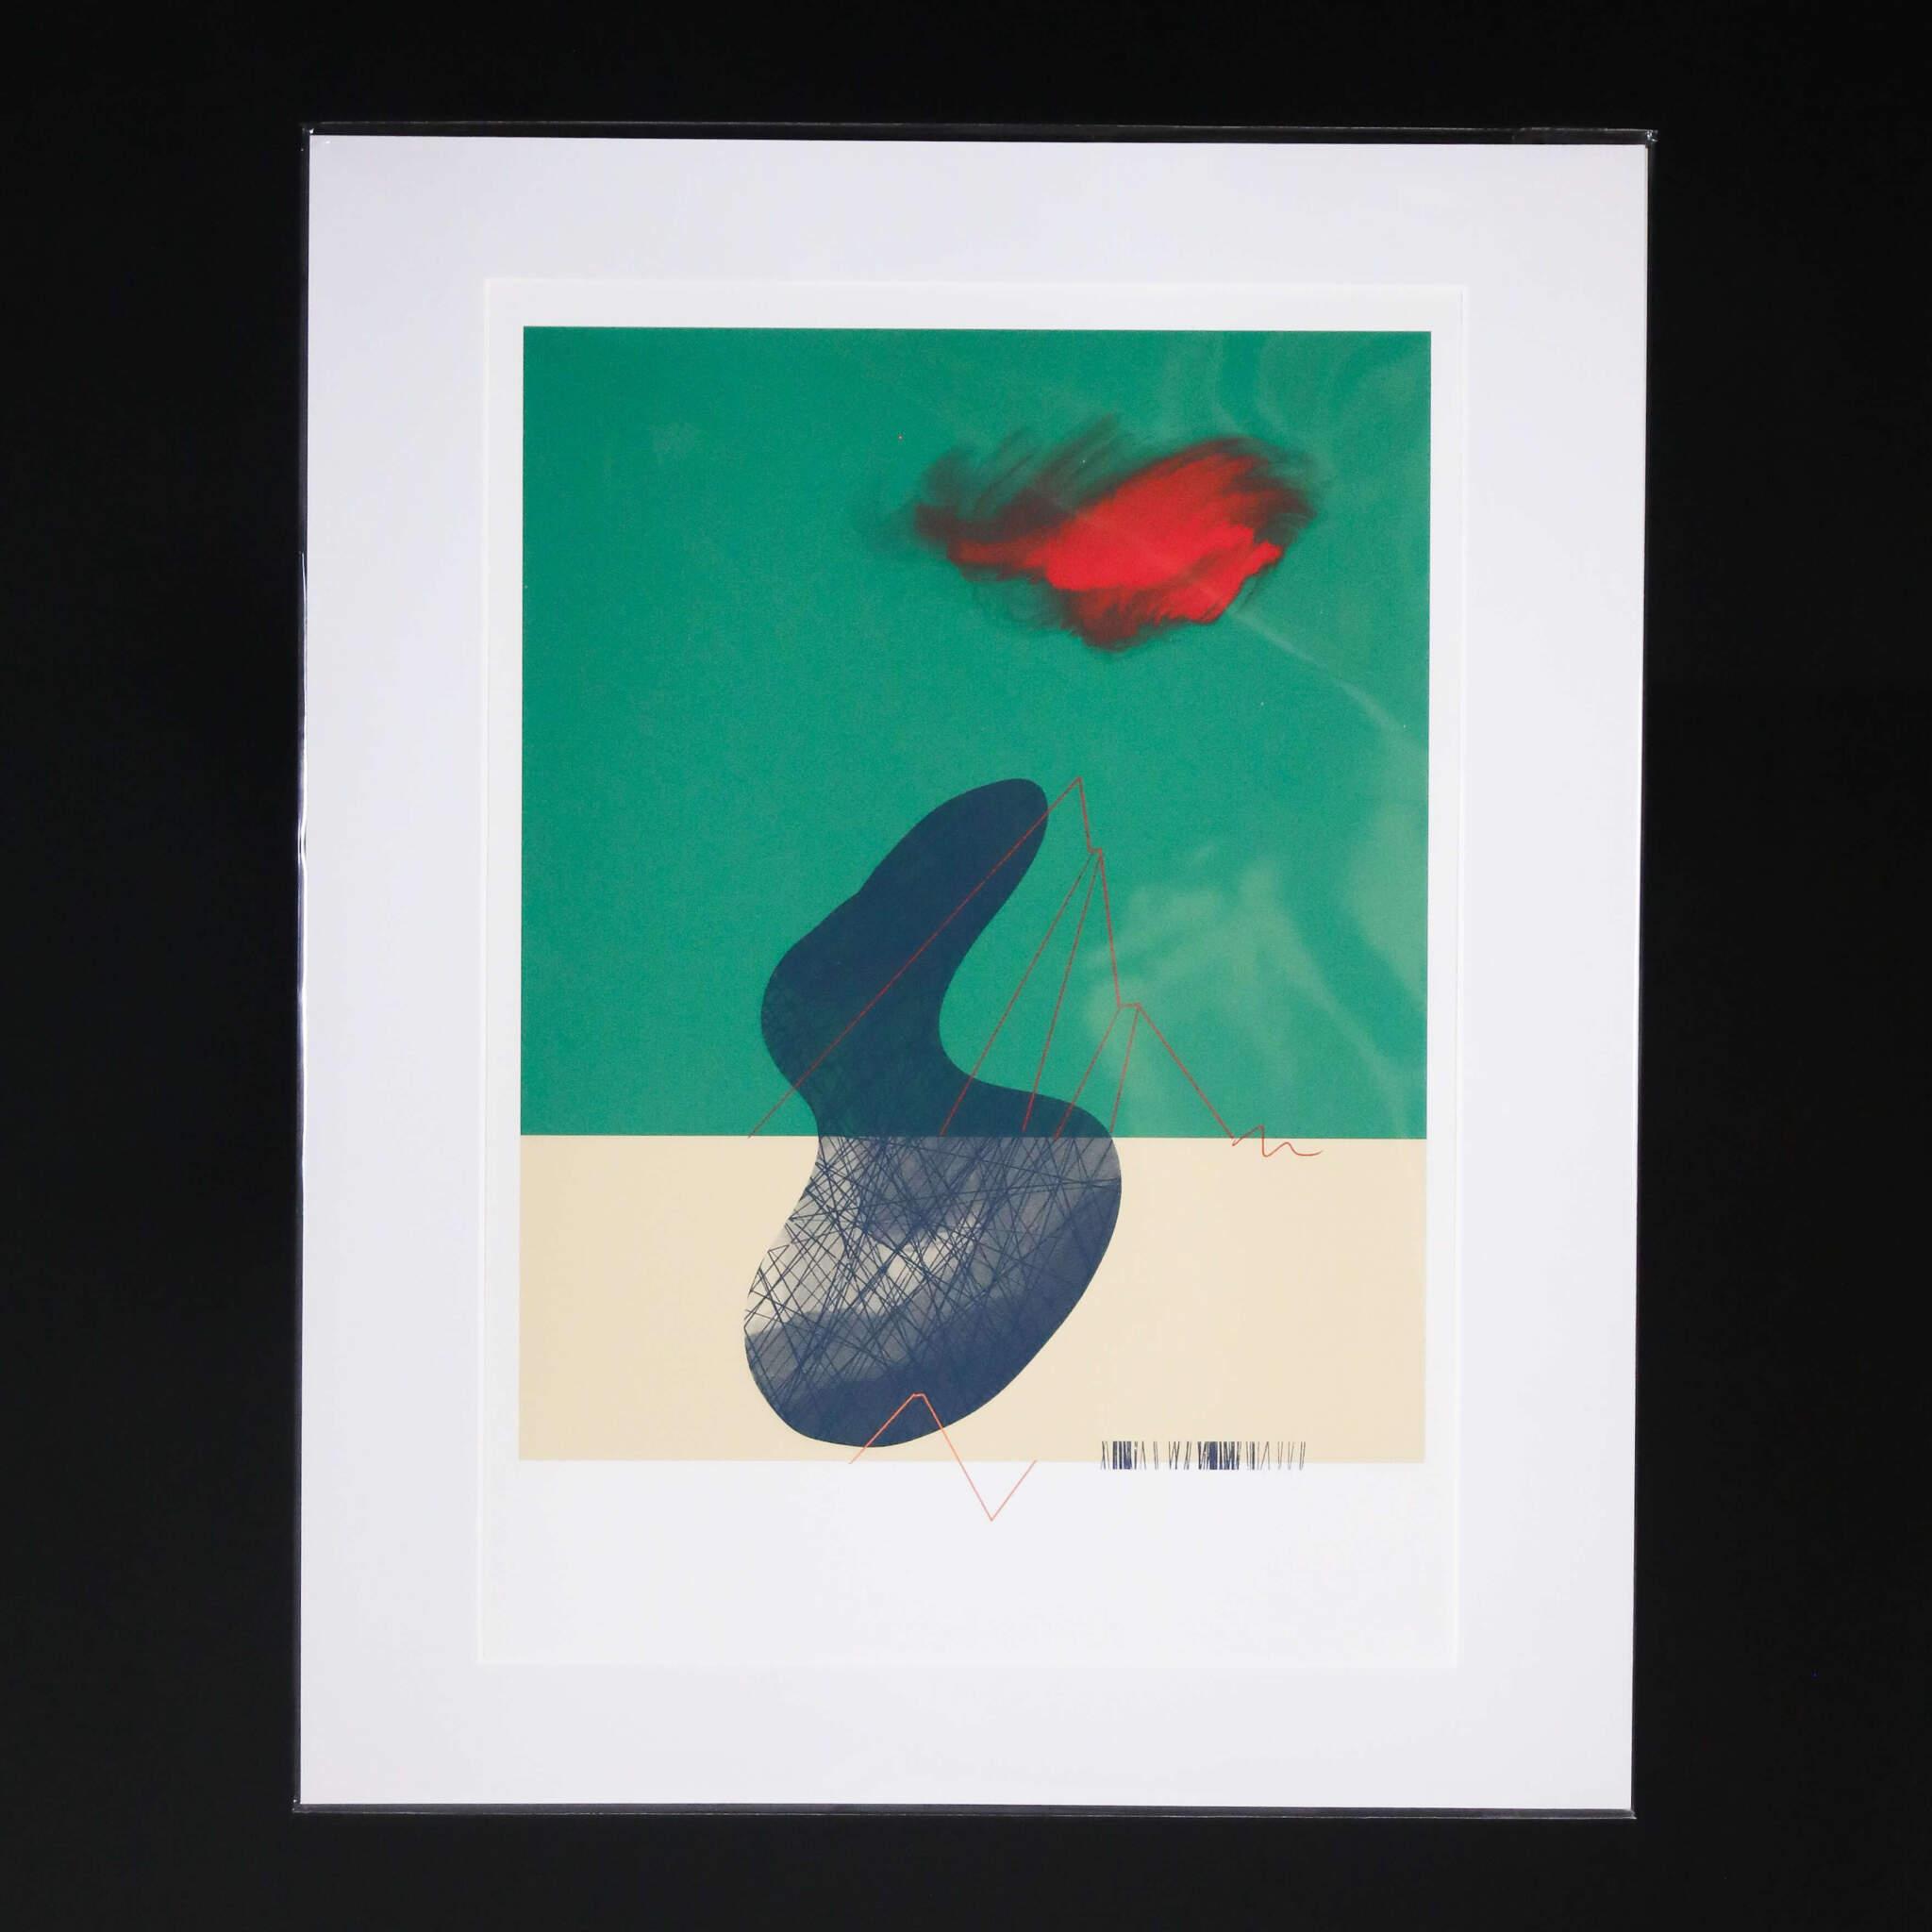 N58A3002 - Comeragh I by Luana Asiata